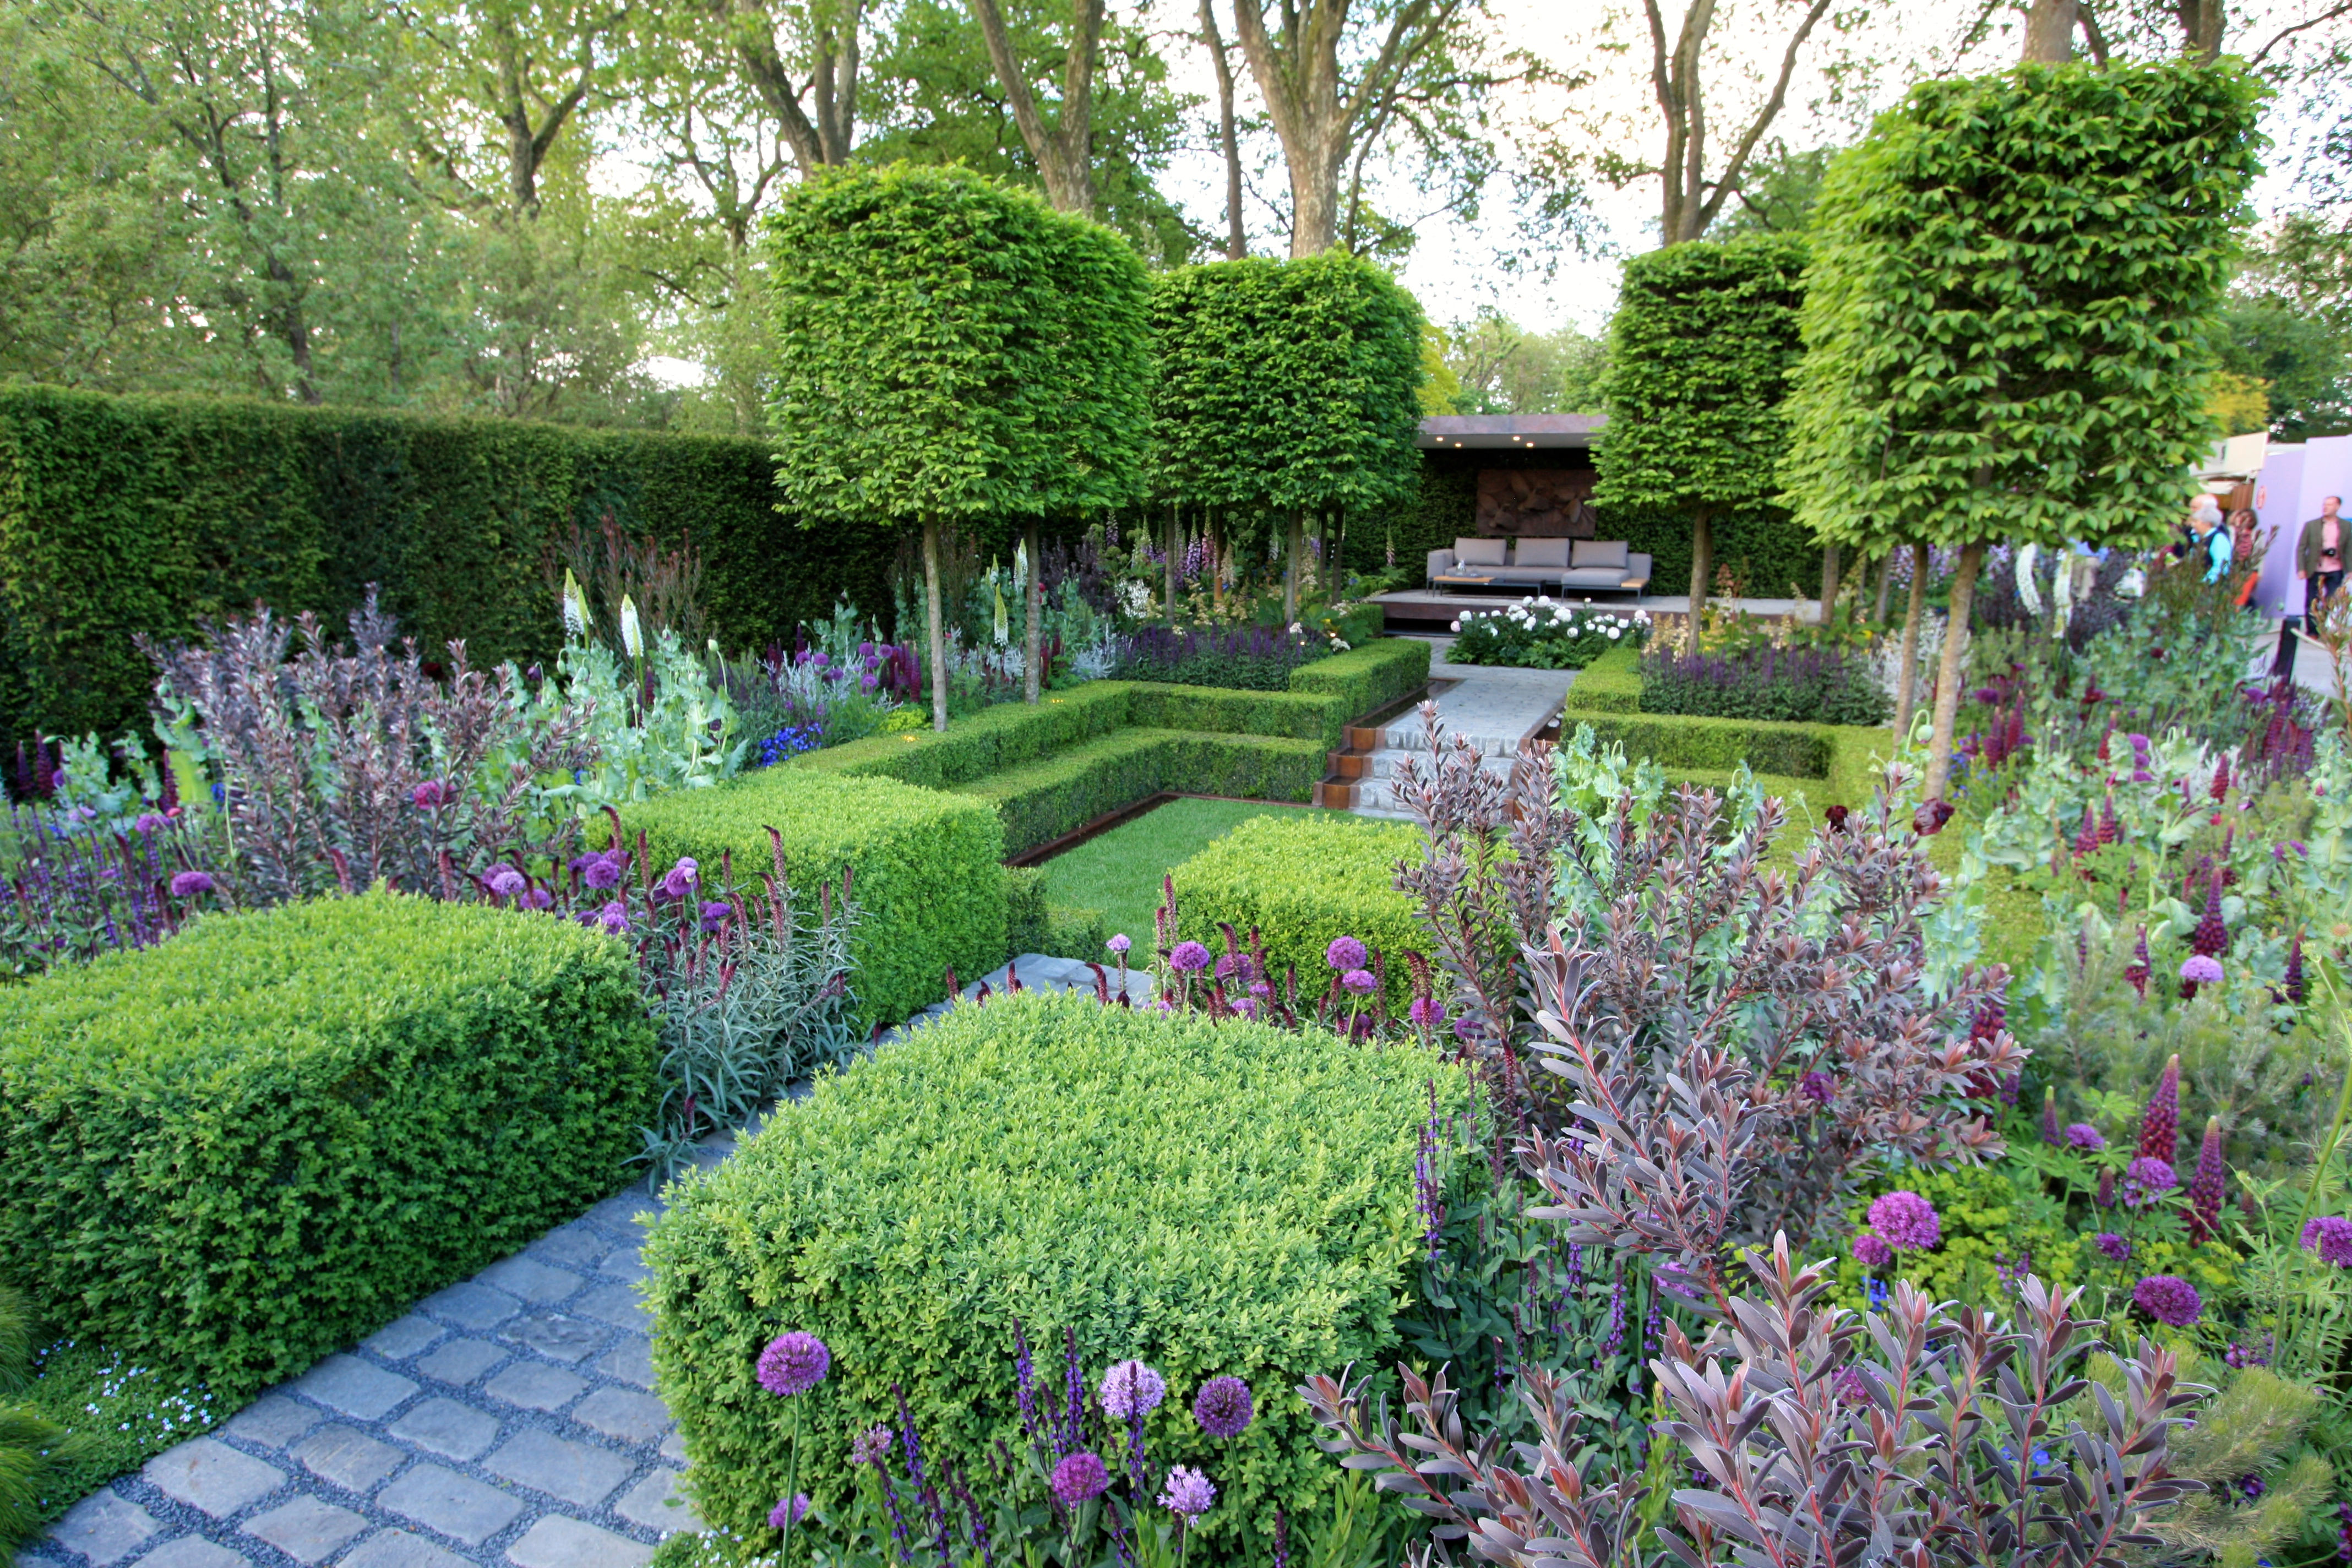 Chelsea flower show 2016 the show gardens the for Chelsea garden designs